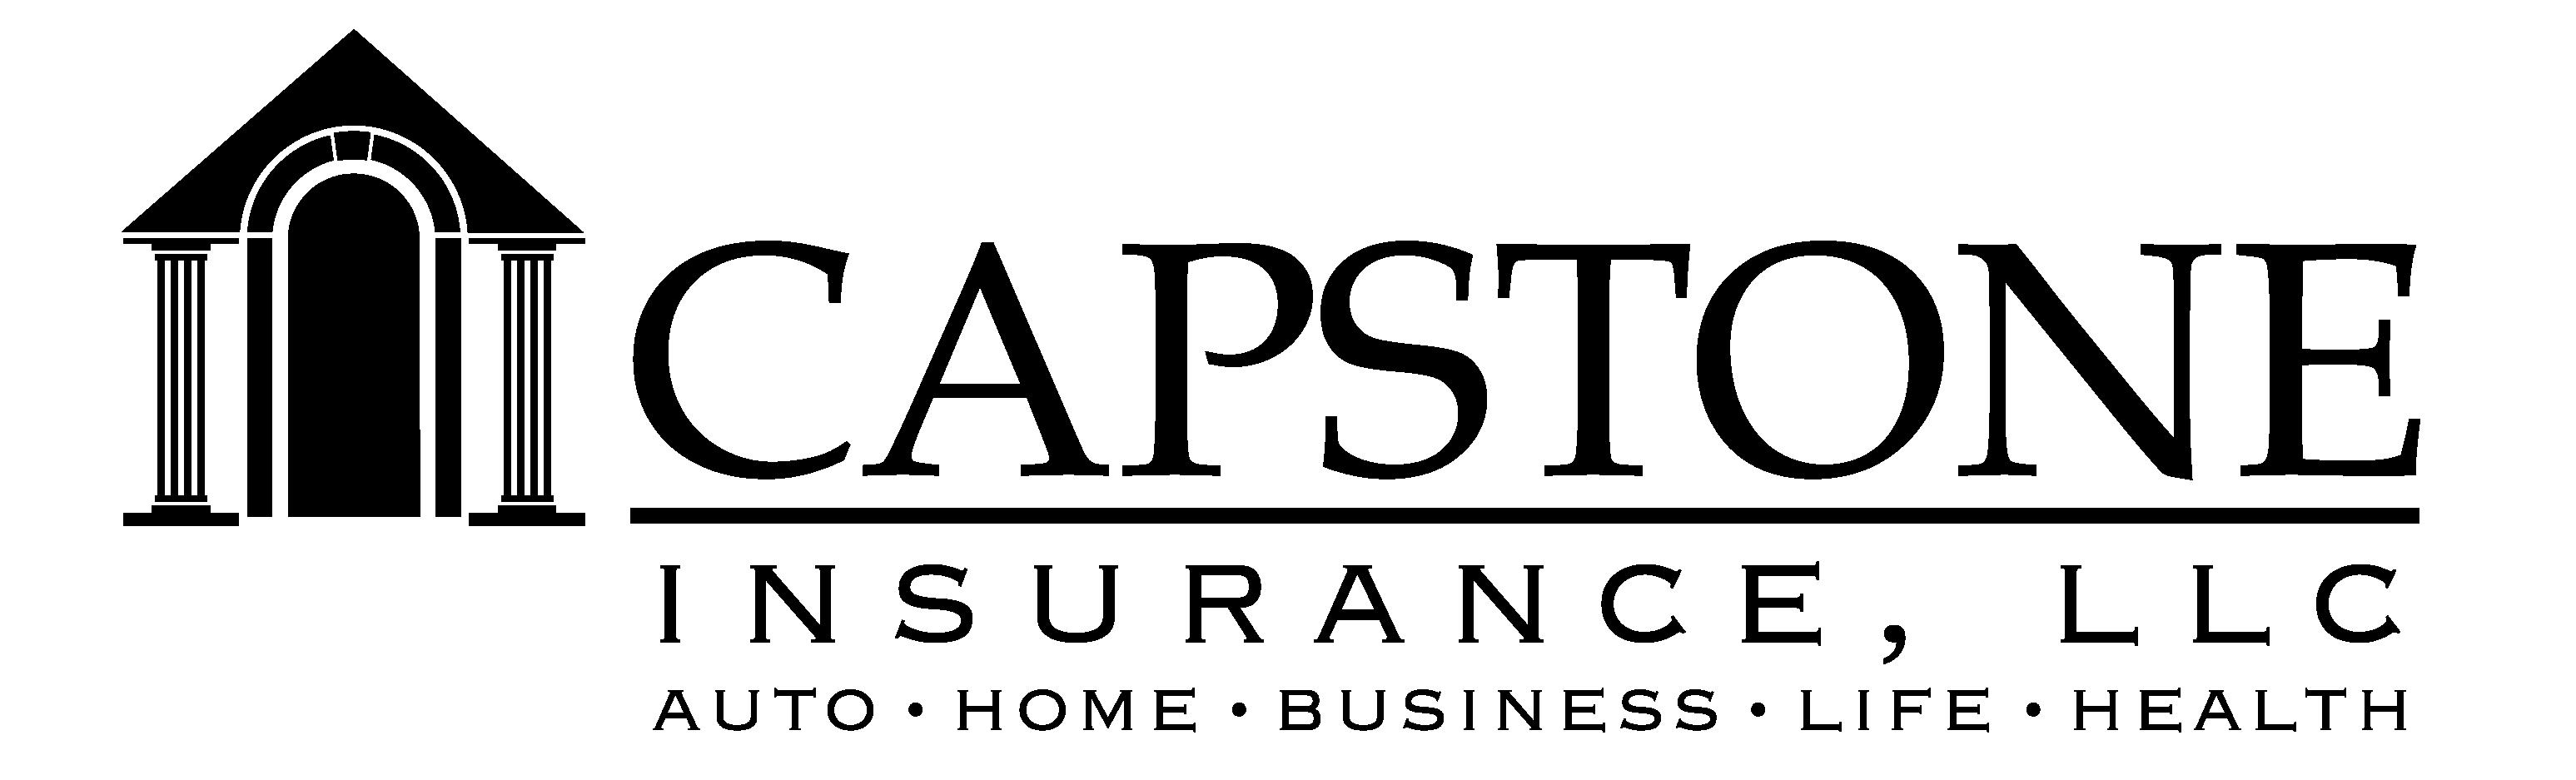 Capstone Insurance logo